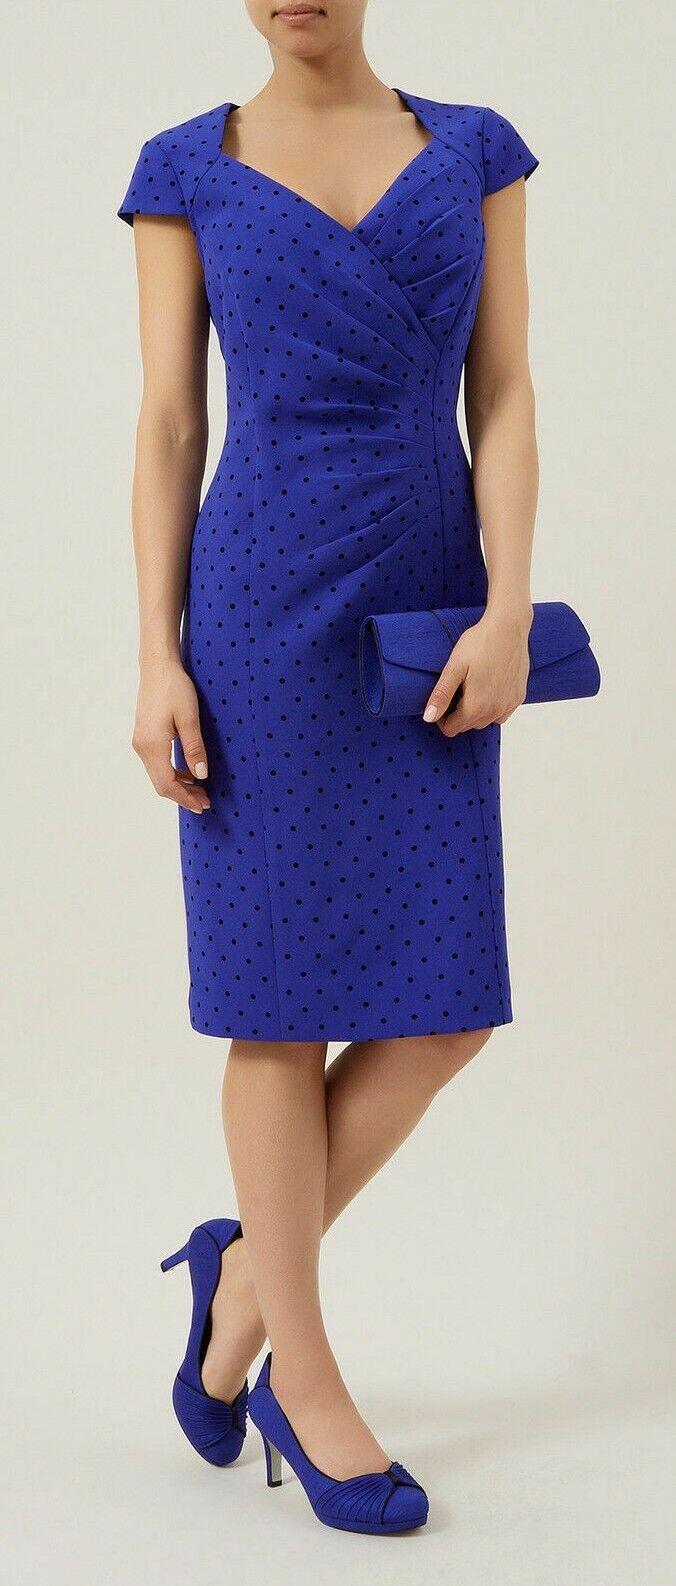 New Jacques Vert dress UK 12 Blue Black spotted Spot mock wrap Pleated rrp